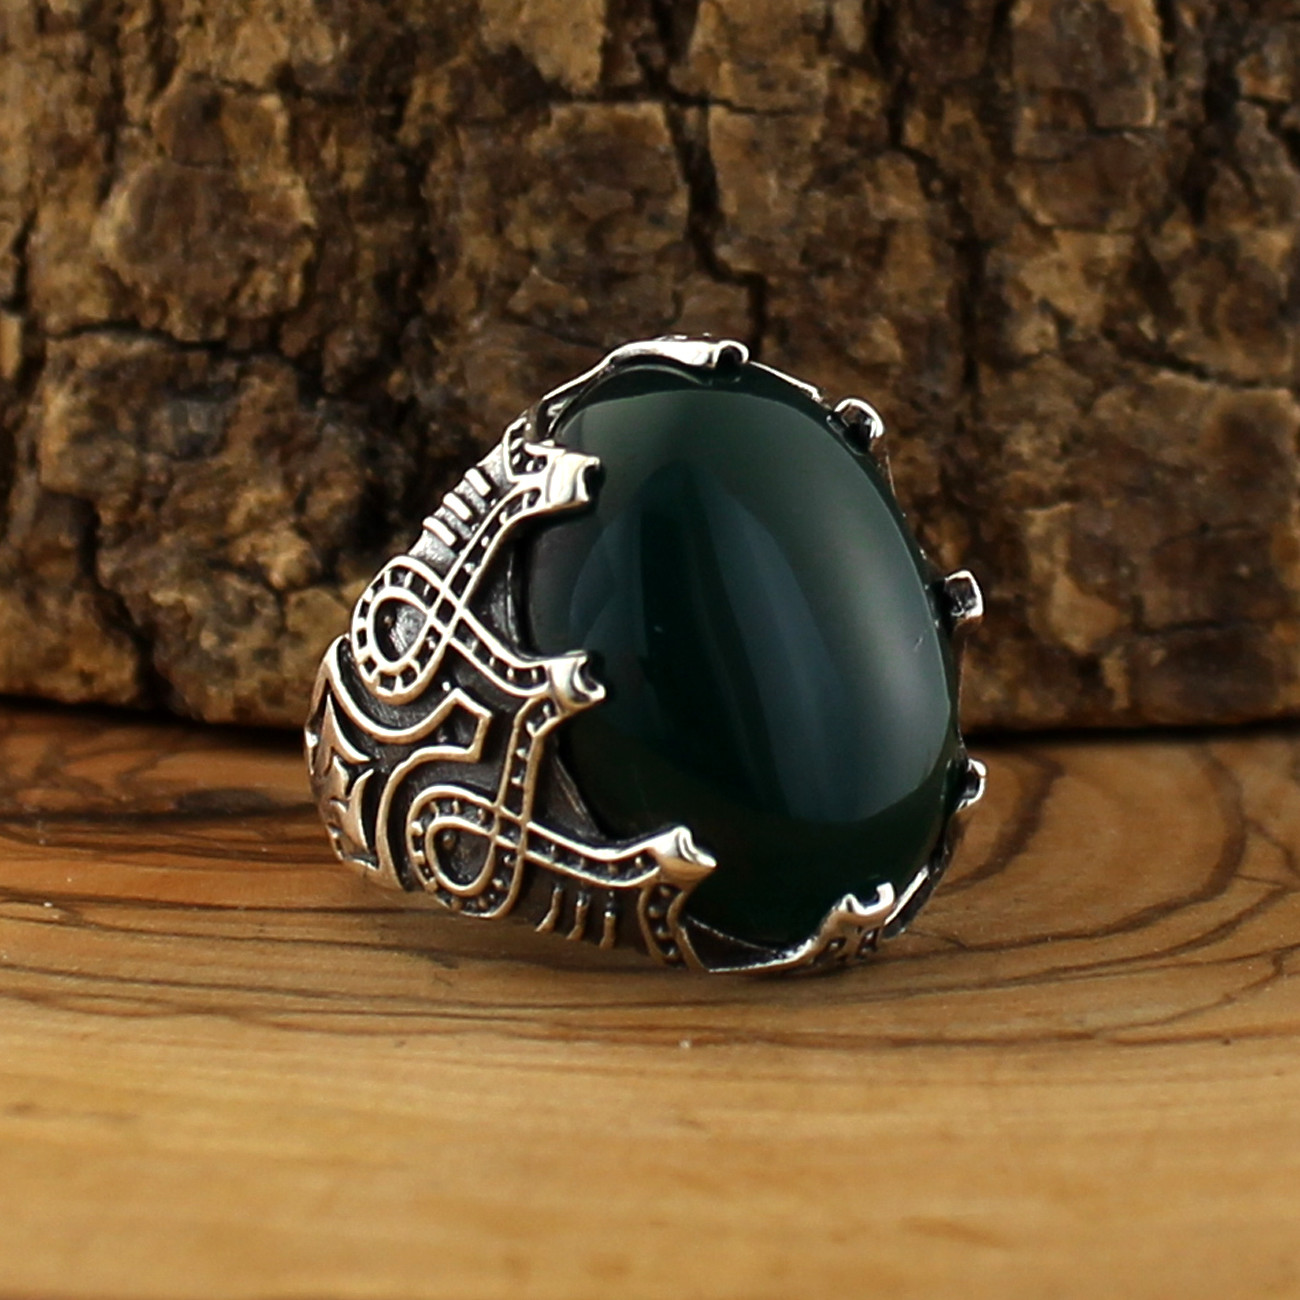 925 Sterling Silver Yellow Zircon Stone Men/'s Ring,Yellow onyx stone handmade men/'s ring,Birhtday gift special silver ring,Onyx stone ring